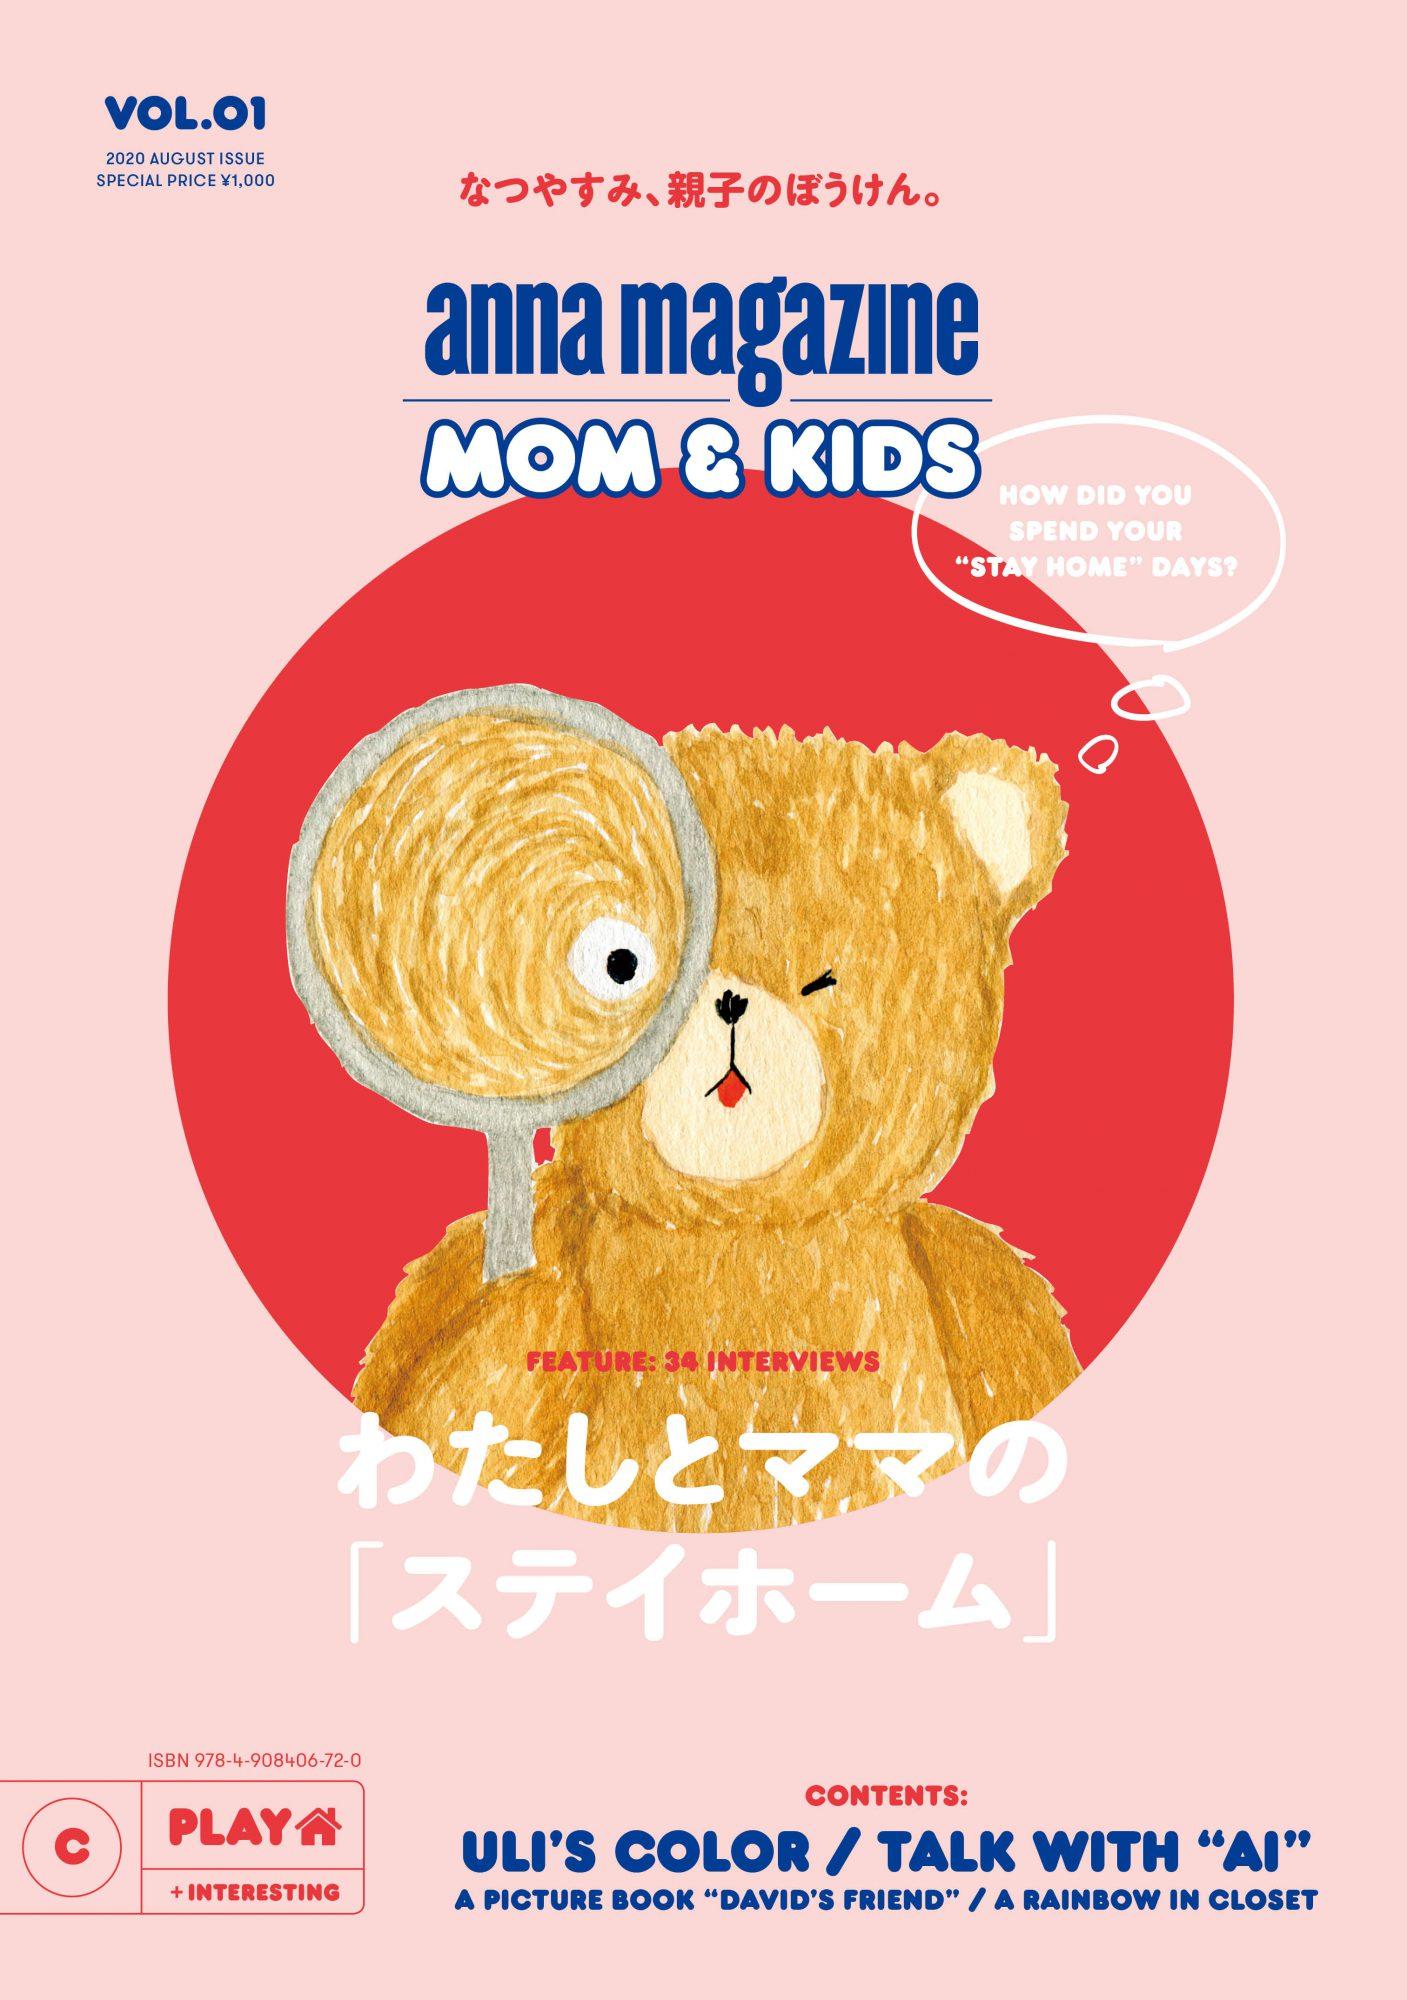 『 anna magazine MOM&KIDS vol.01 』